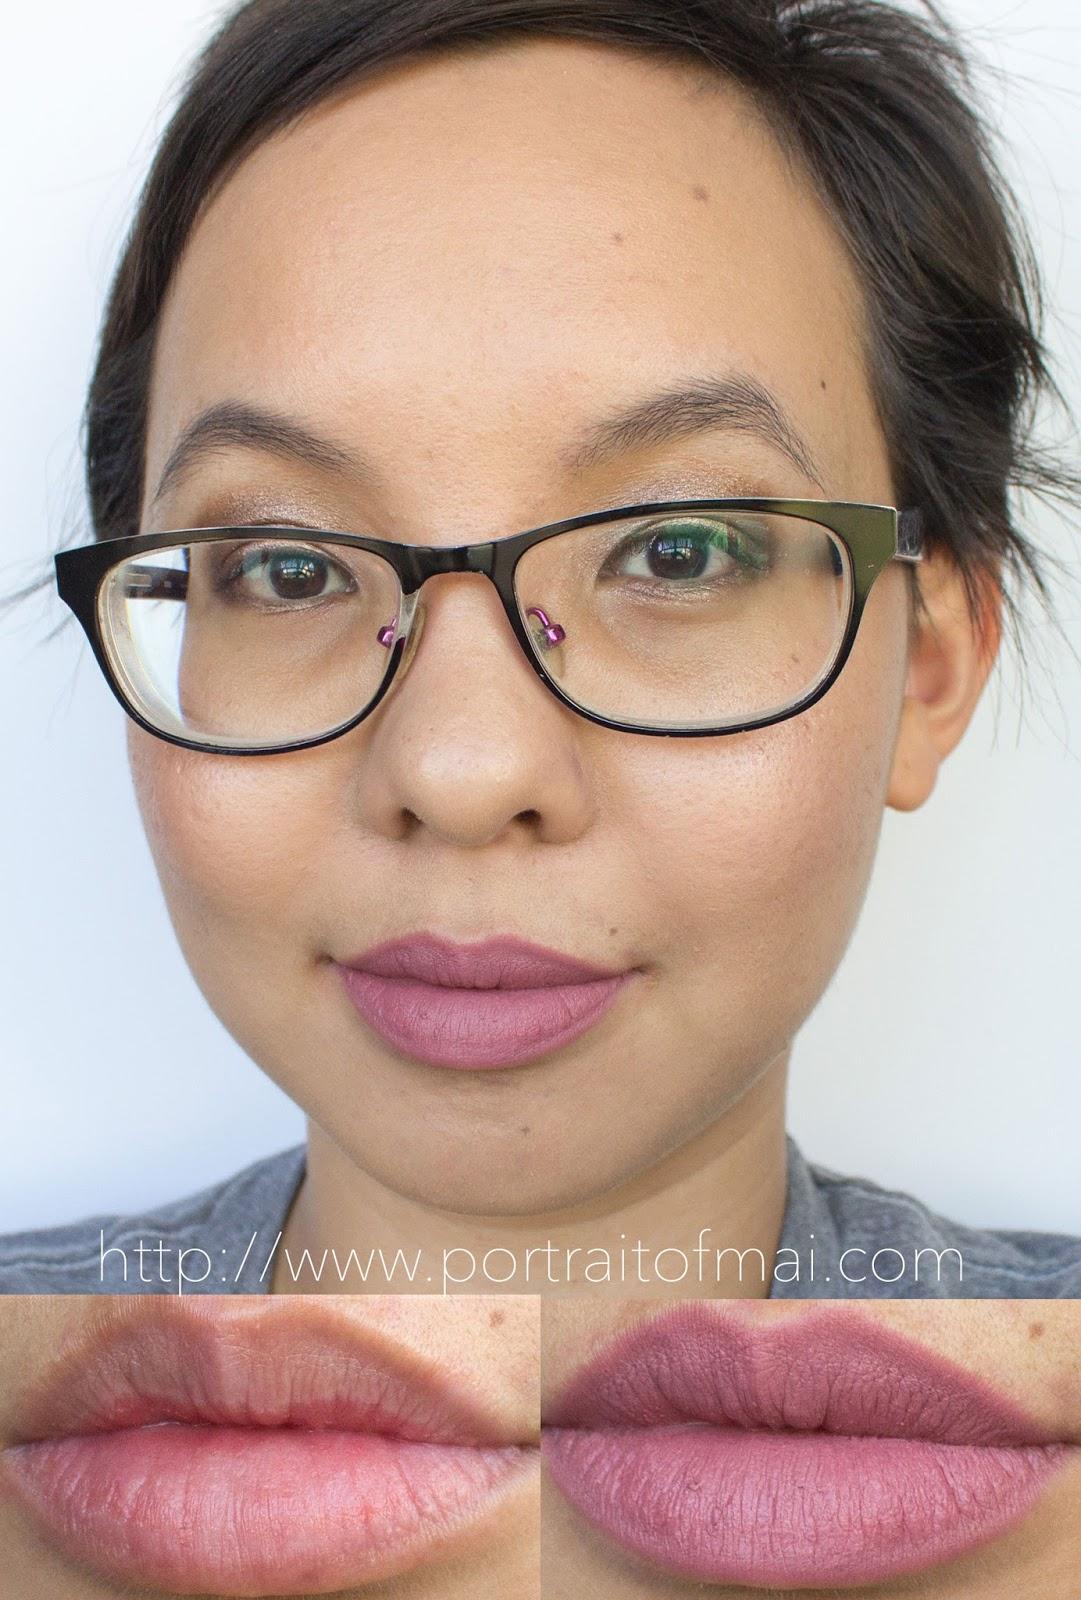 Kat Von D Lovecraft Lipstick The Hippest Pics